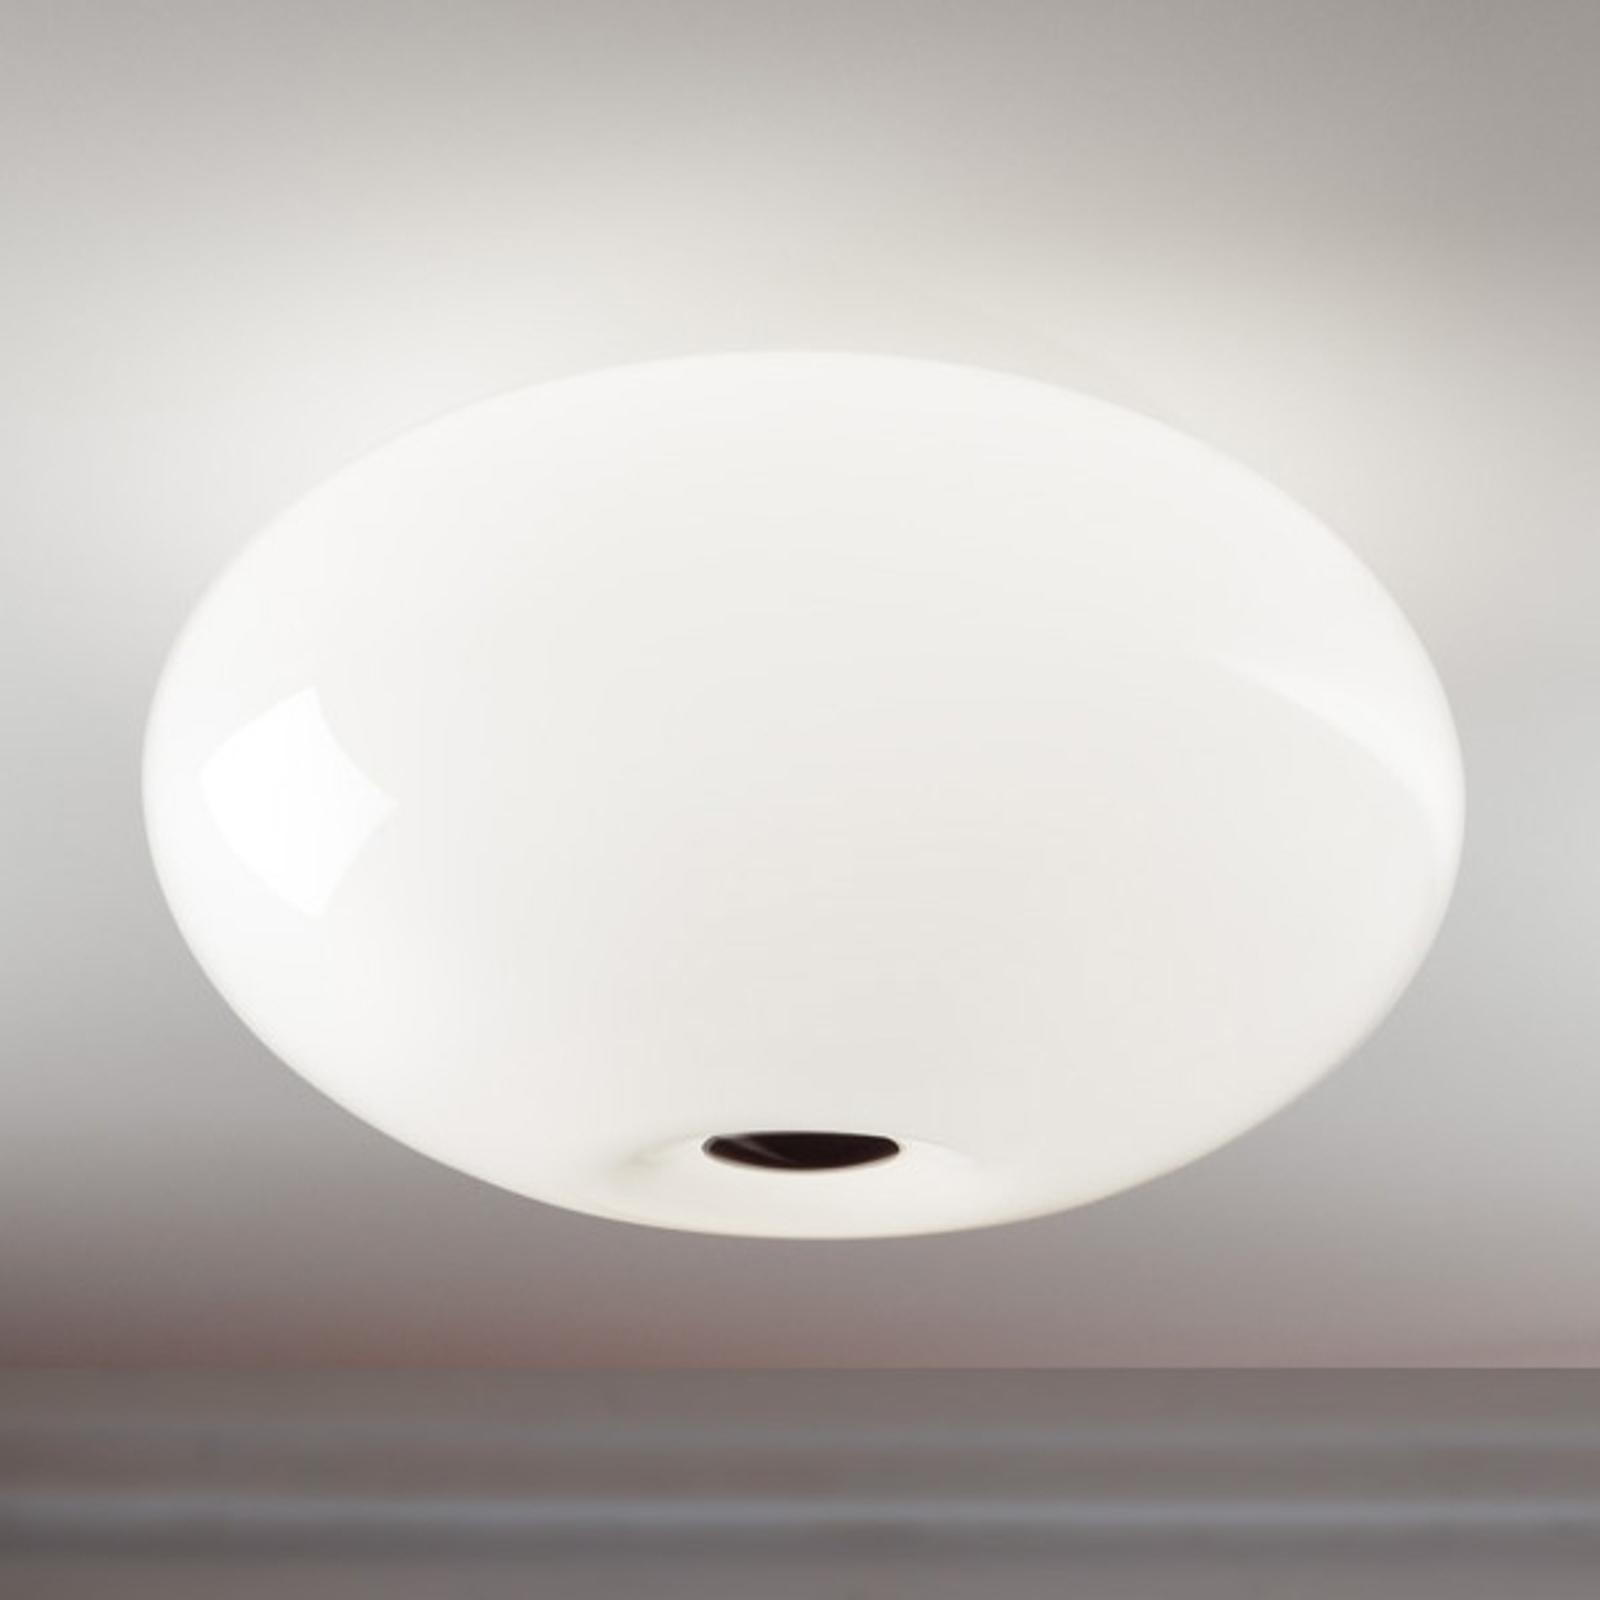 Fraaie plafondlamp AIH, 38 cm, wit glanzend